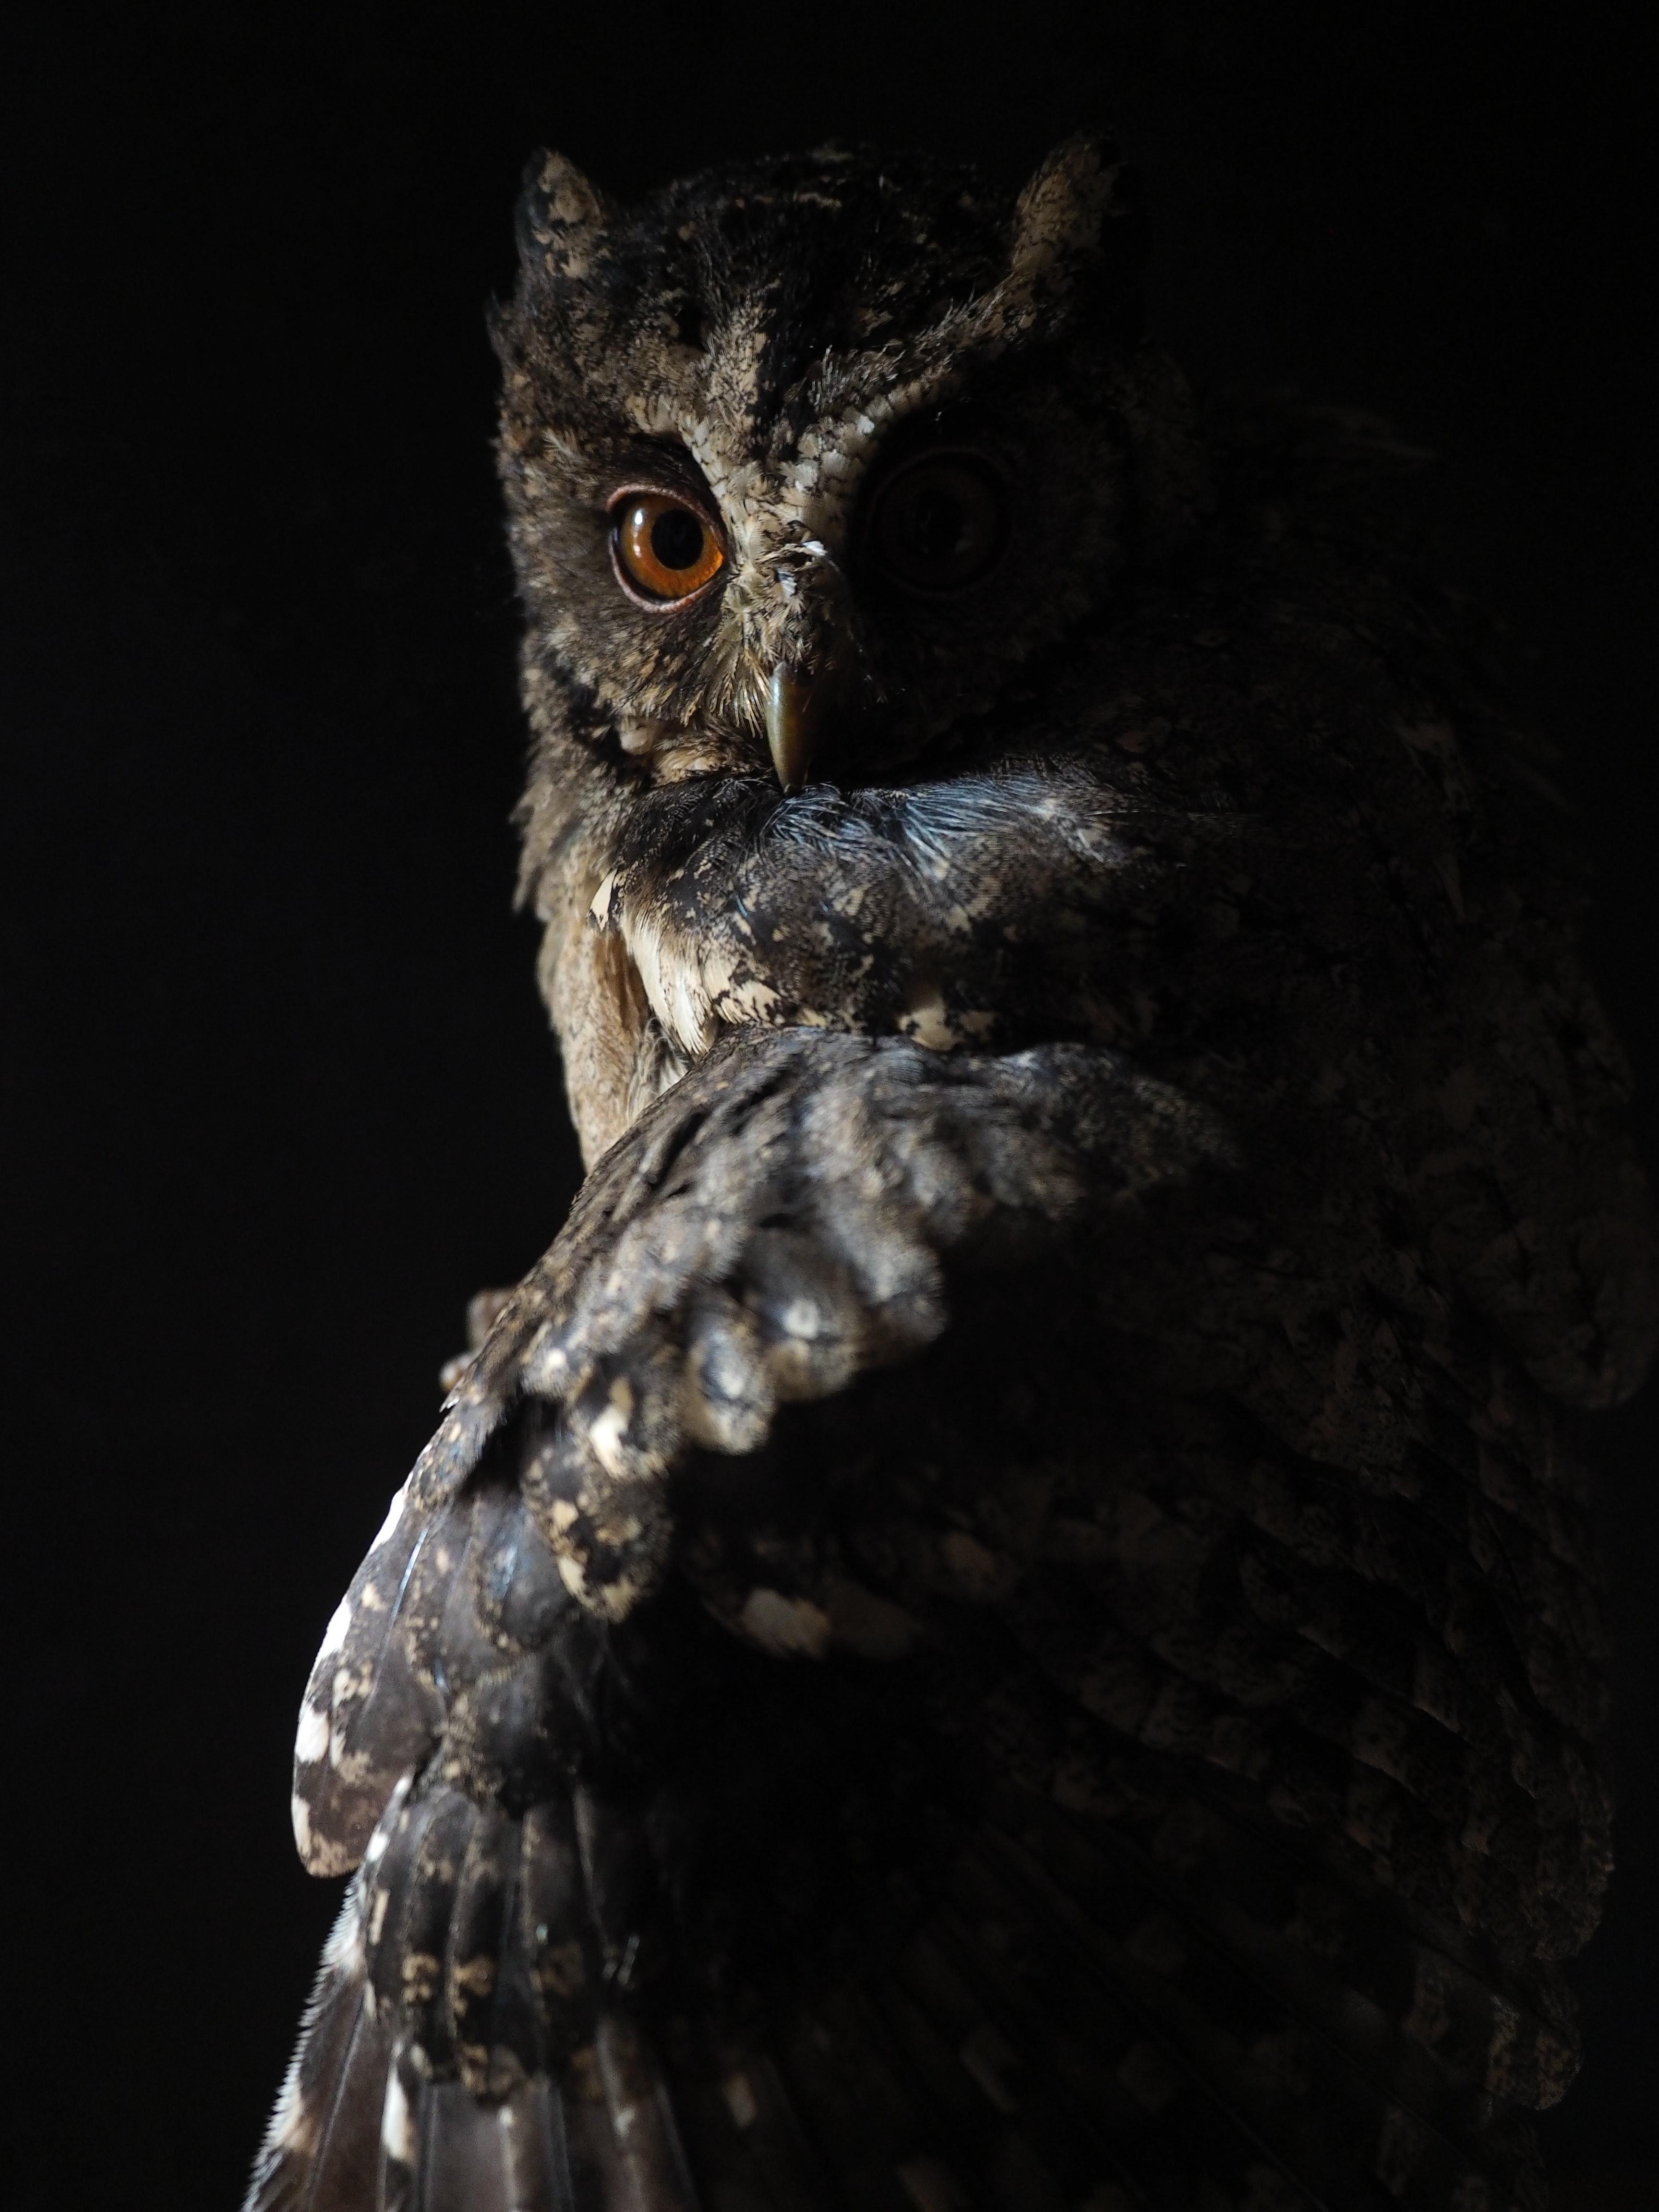 Owl Wallpapers Free Hd Download 500 Hq Unsplash